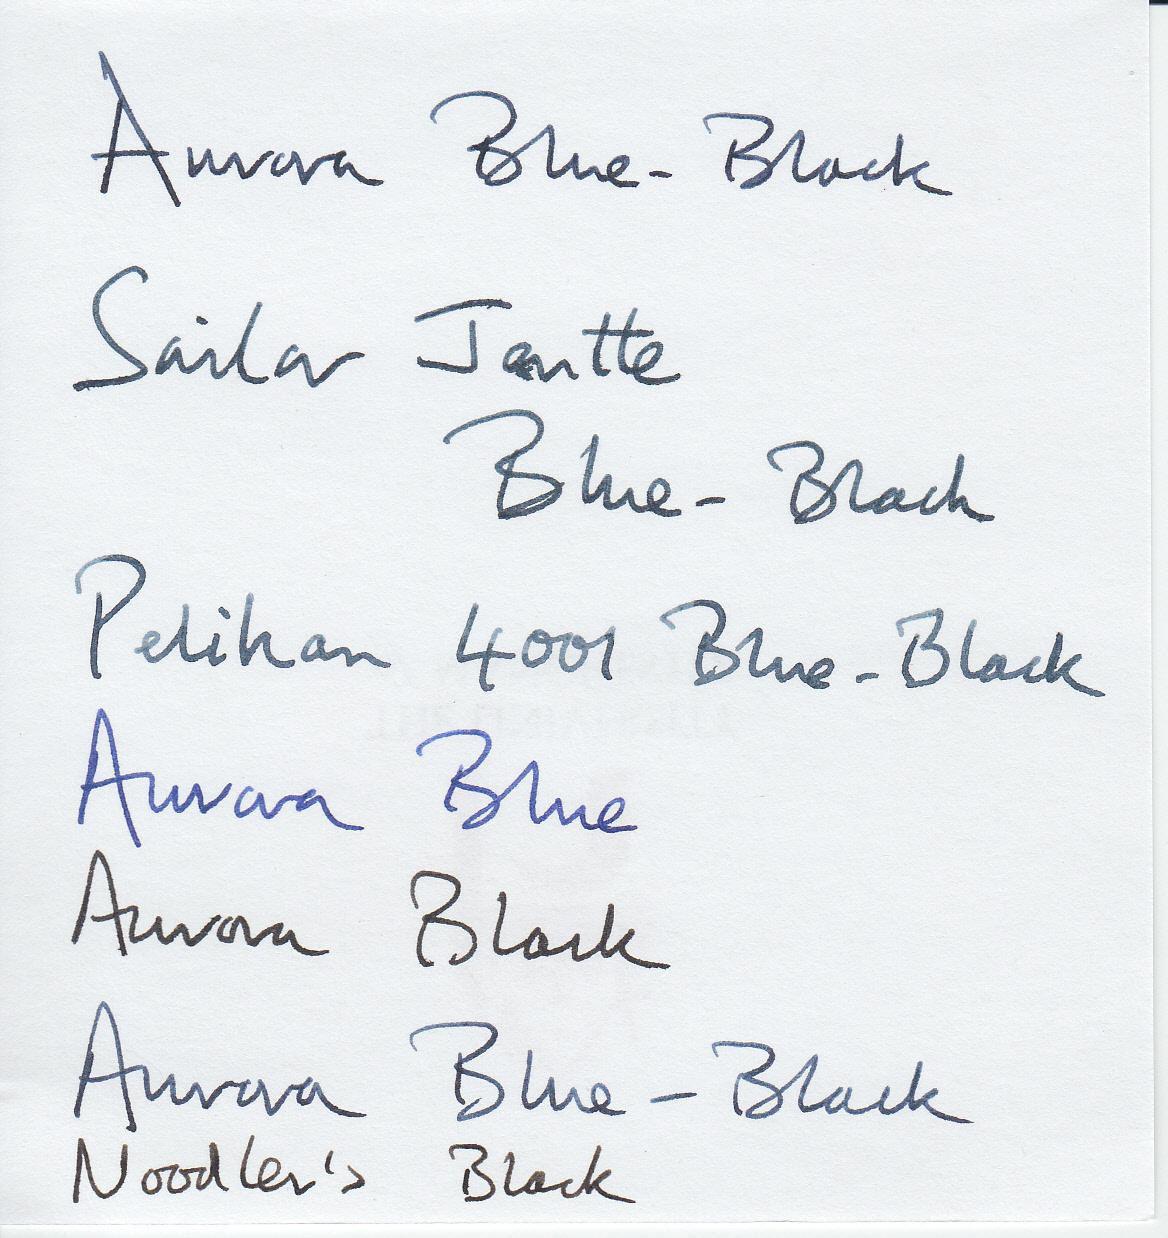 fpn_1490004986__aurora_blue-black_soak_t